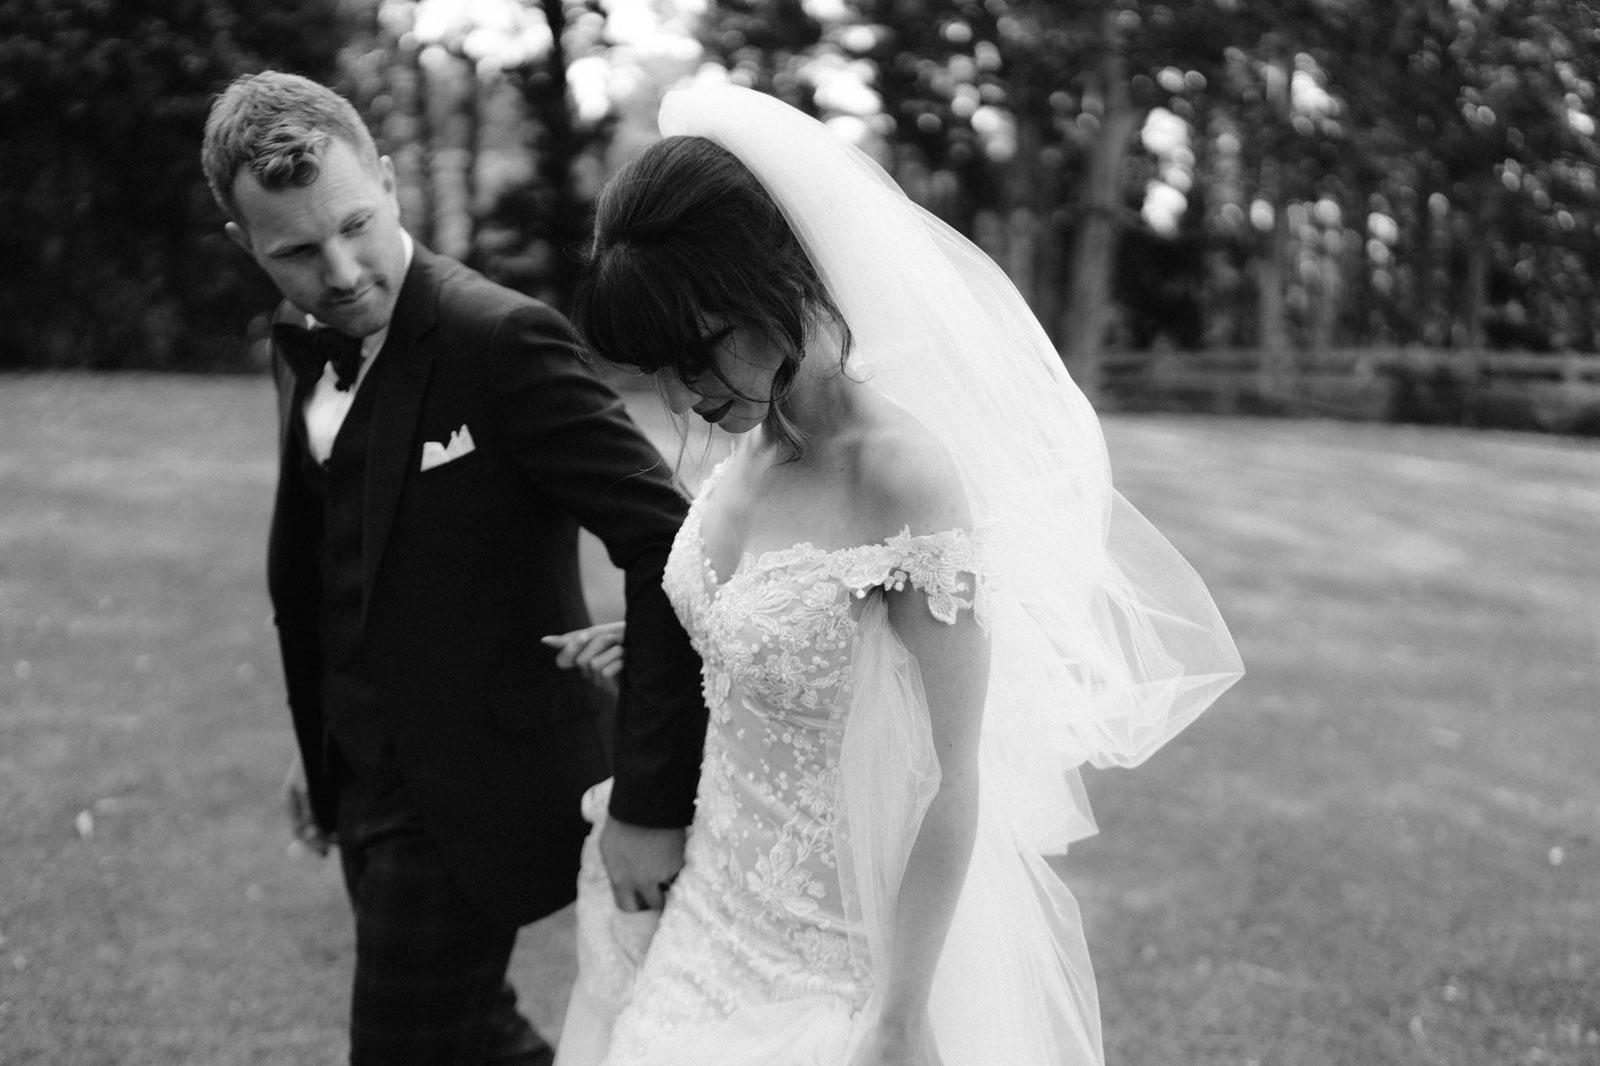 newfound-n-c-olive-tree-cottage-tauranga-wedding-photographer-911A